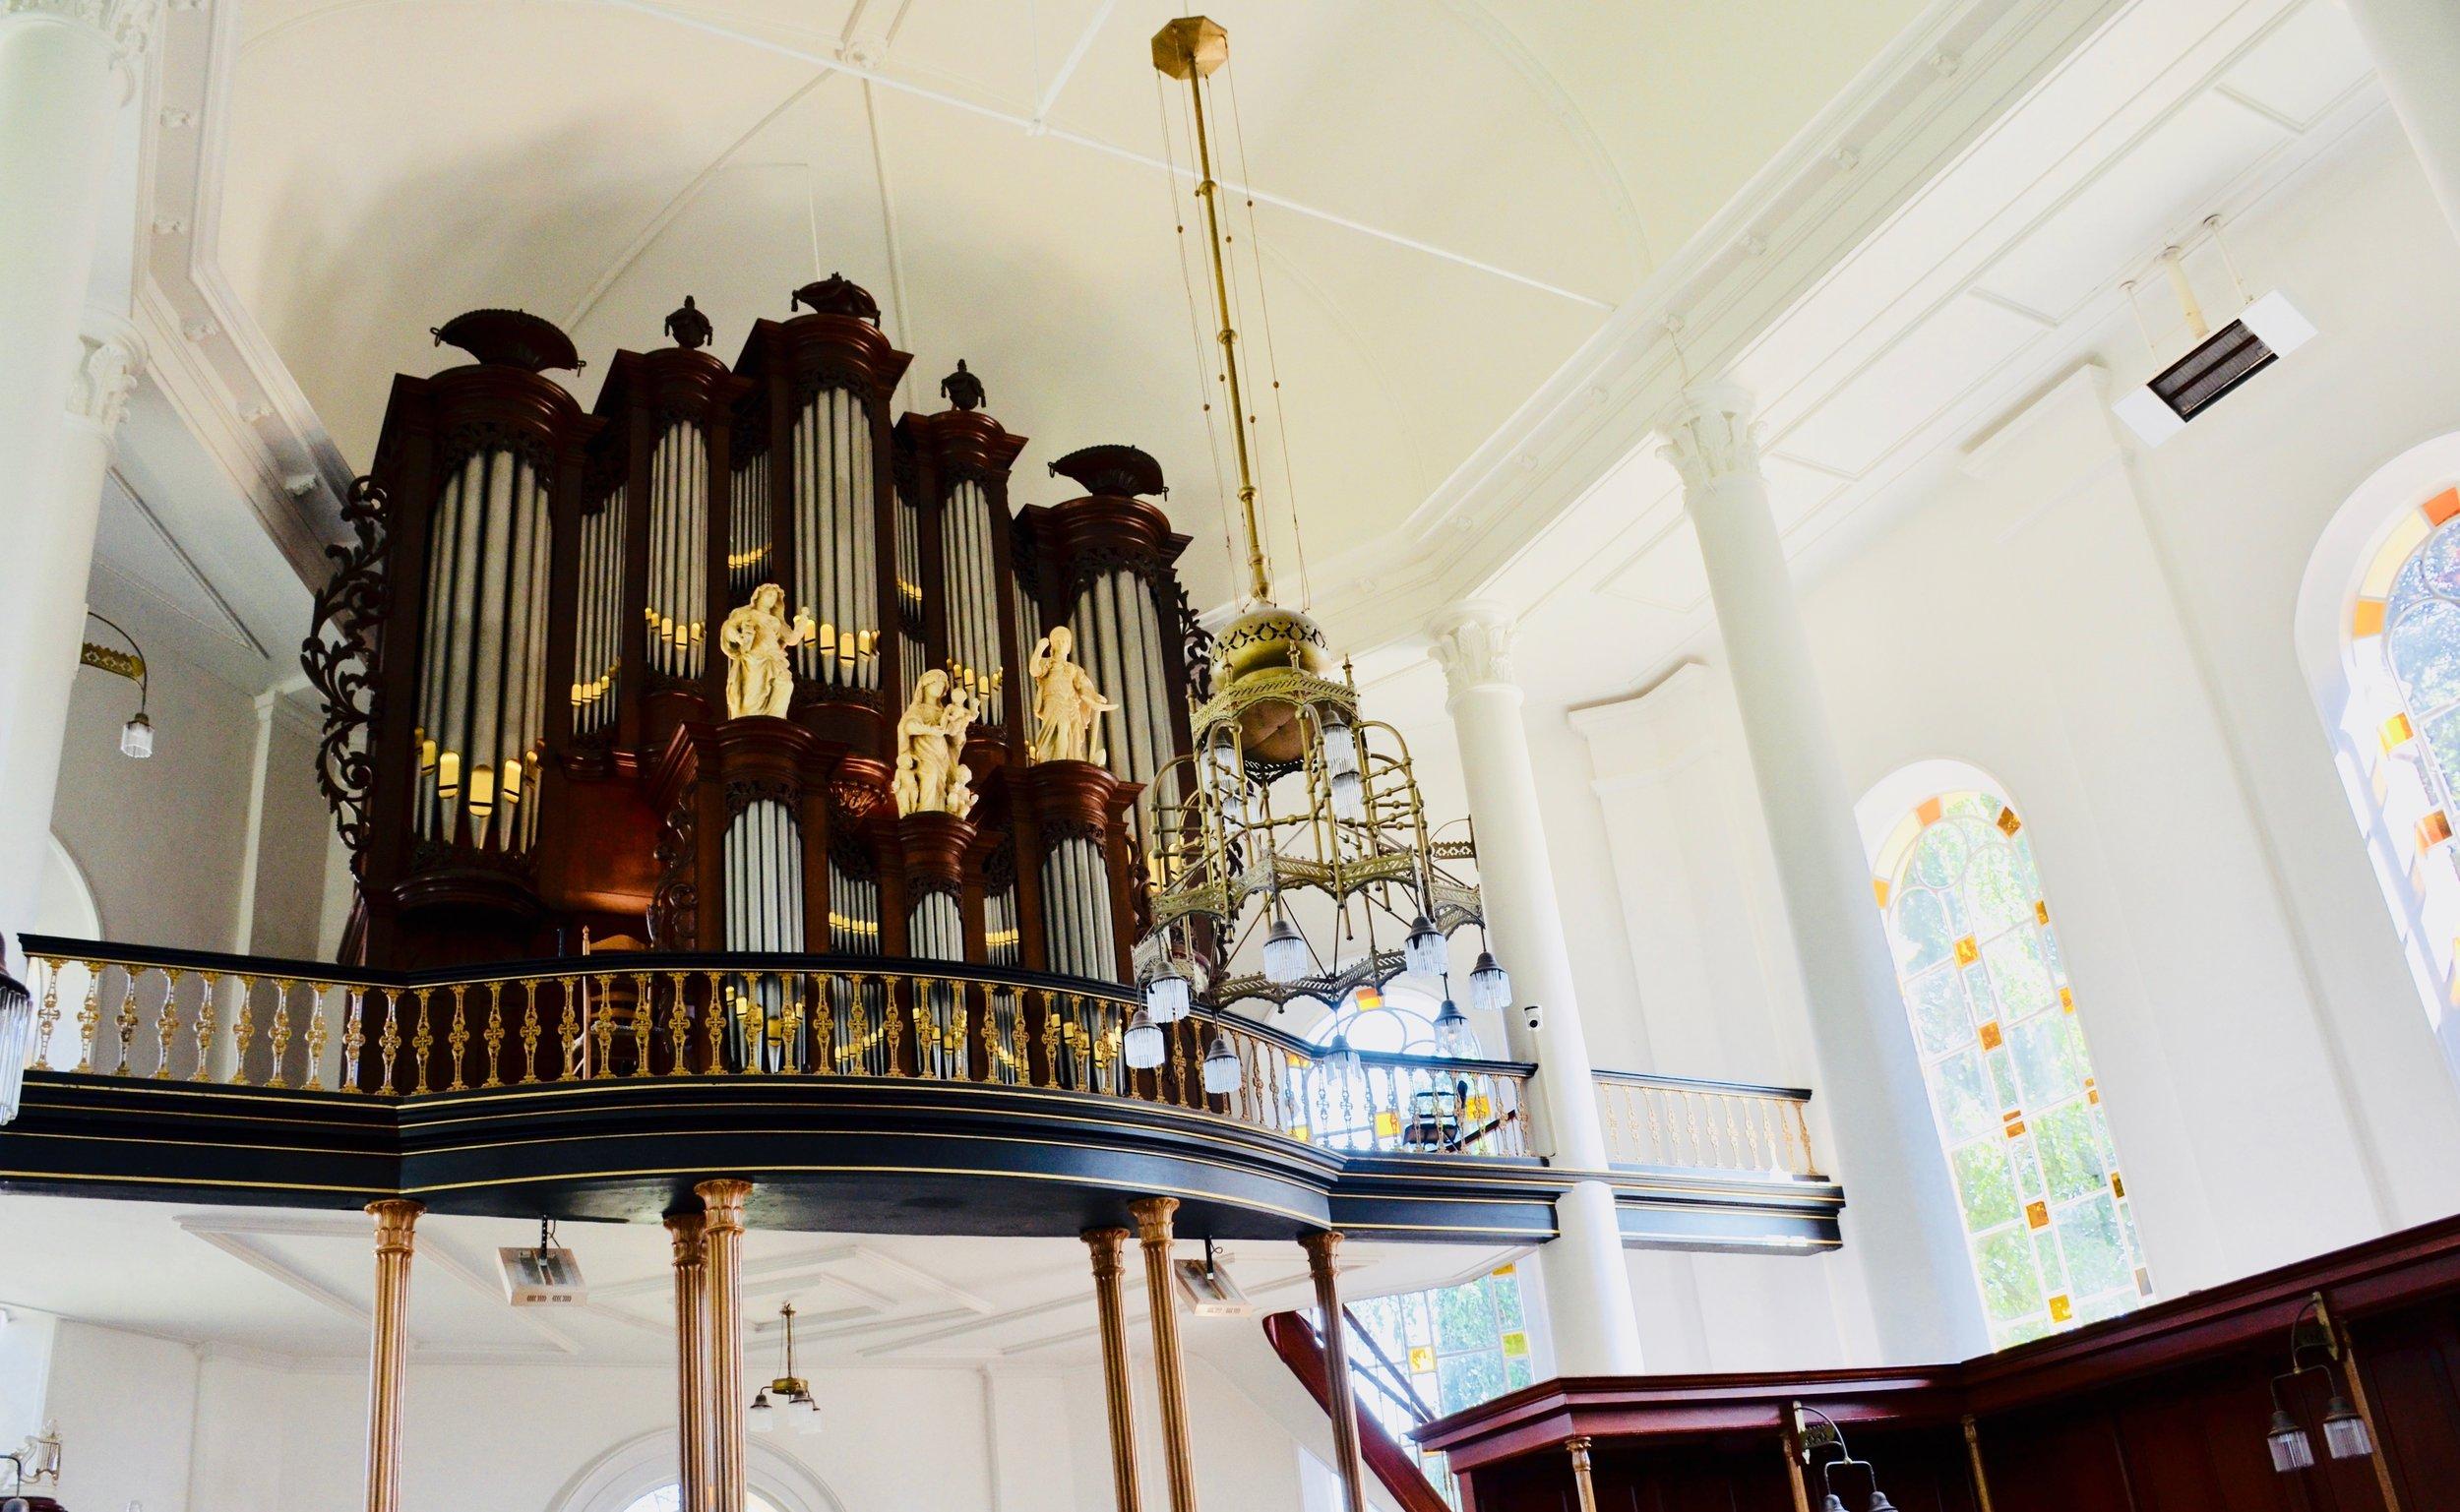 1823 Lohman organ, Hervormde kerk, Farmsum, Netherlands.